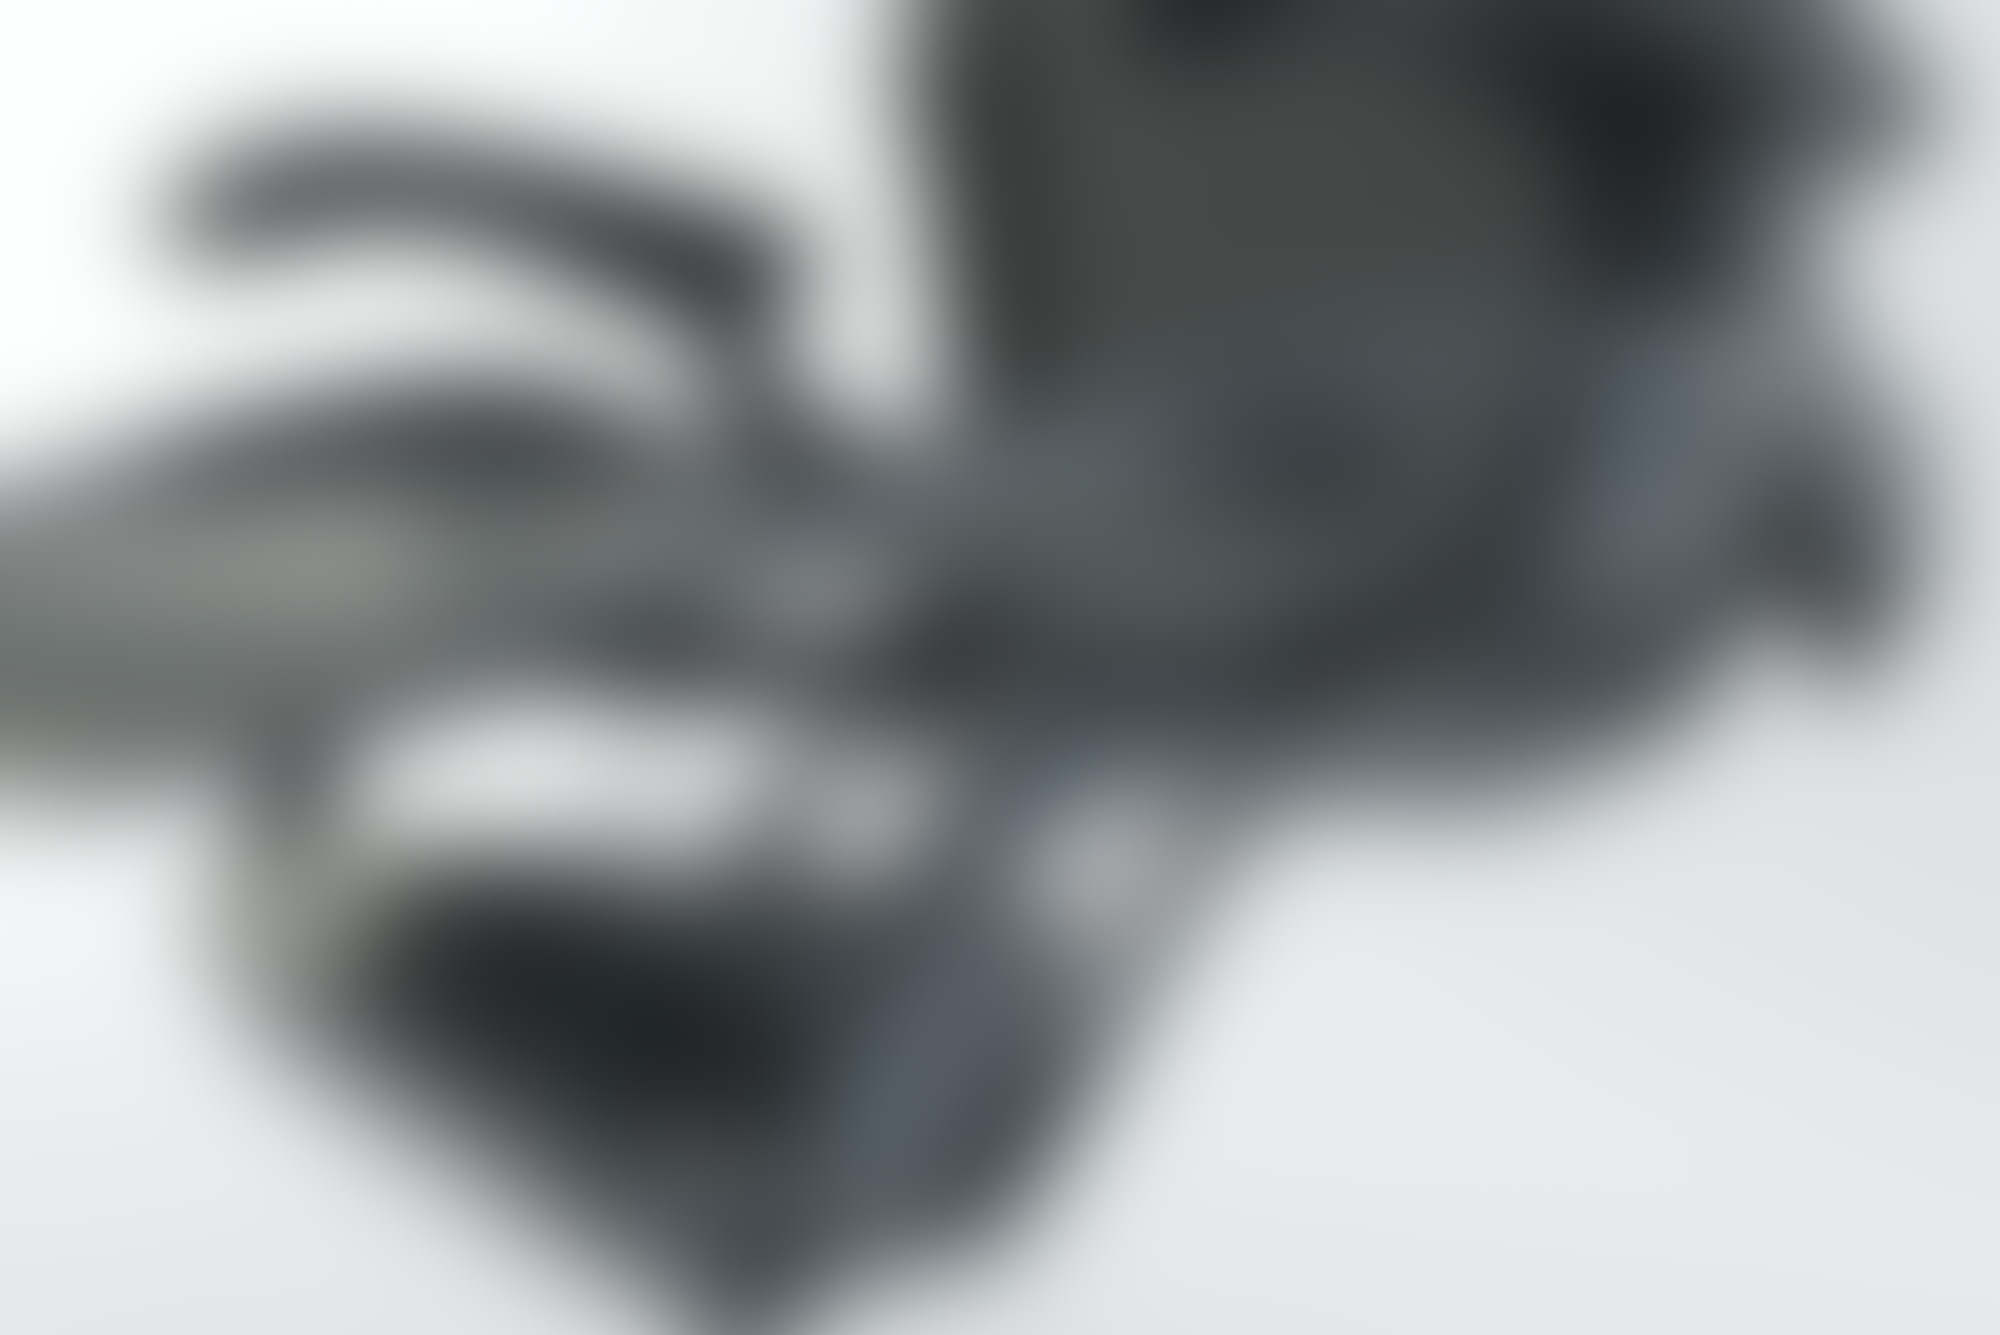 Markleechairlectureinprogress2 autocompressfitresizeixlibphp 1 1 0max h2000max w3 D2000q80sef0c7919592e9bf4a0392c7a52ce33f0